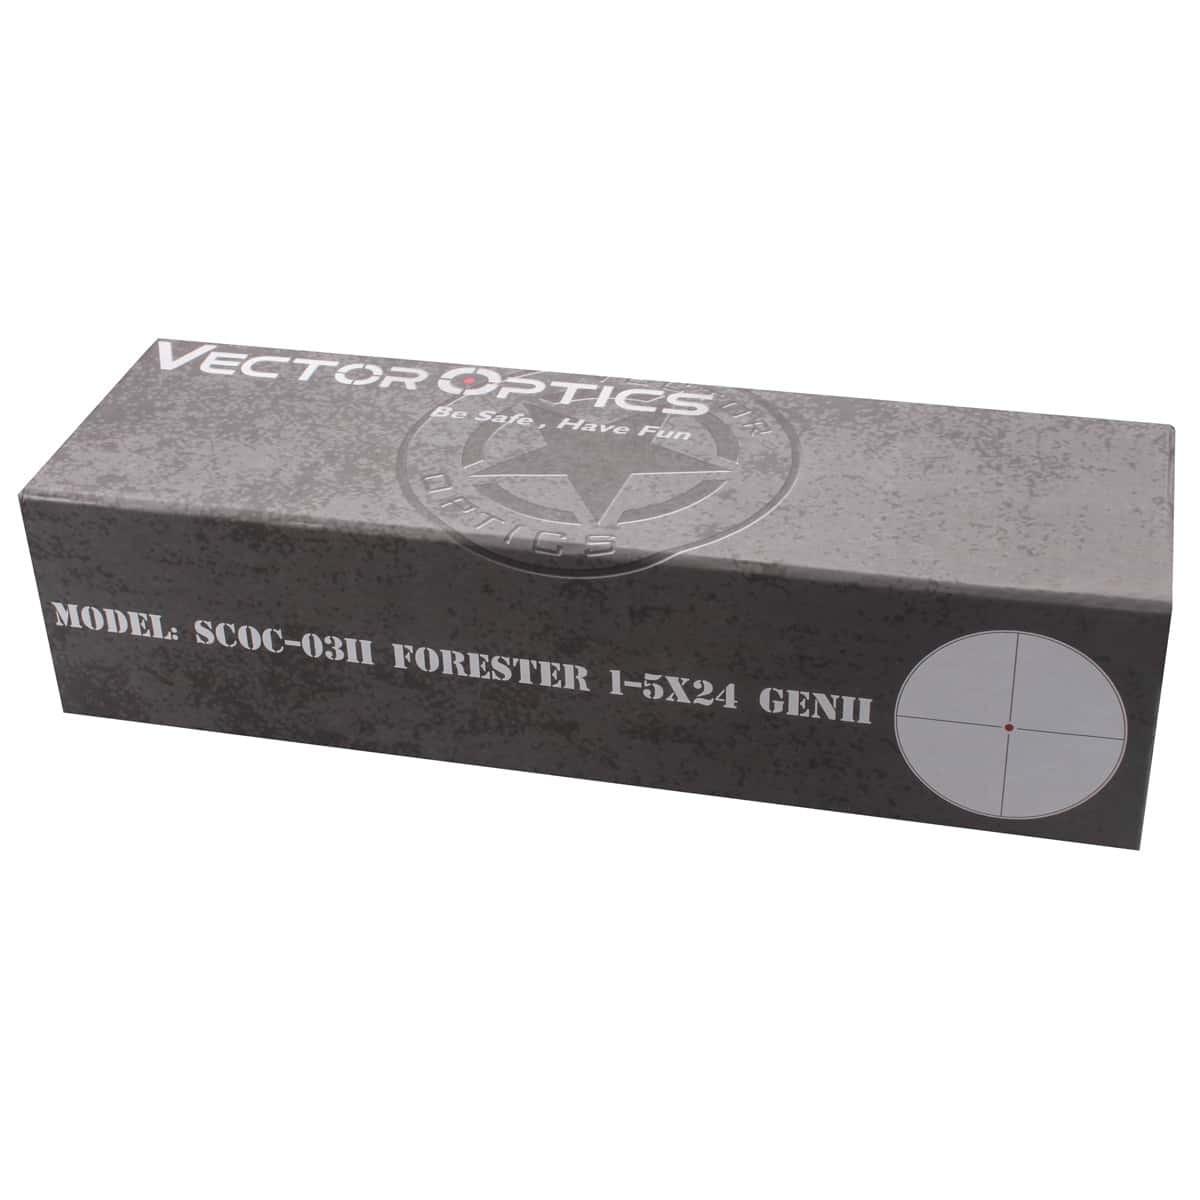 Forester 1-5x24SFP GenII Riflescope